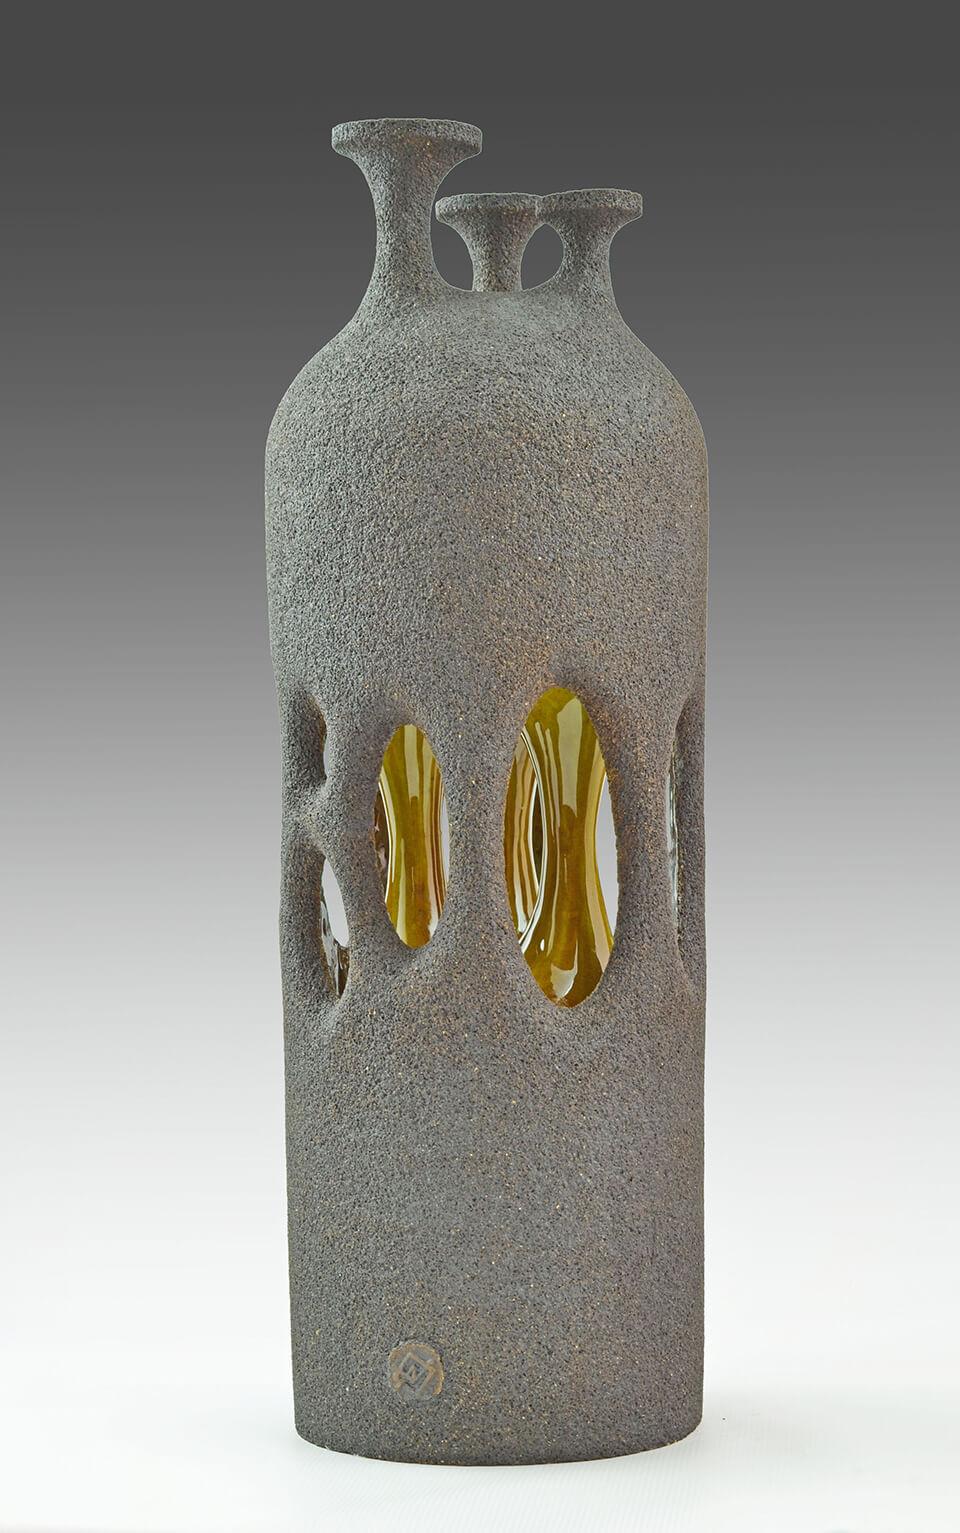 Arek Nowicki 'Three Golden Hearts' stonware with crystalline glaze